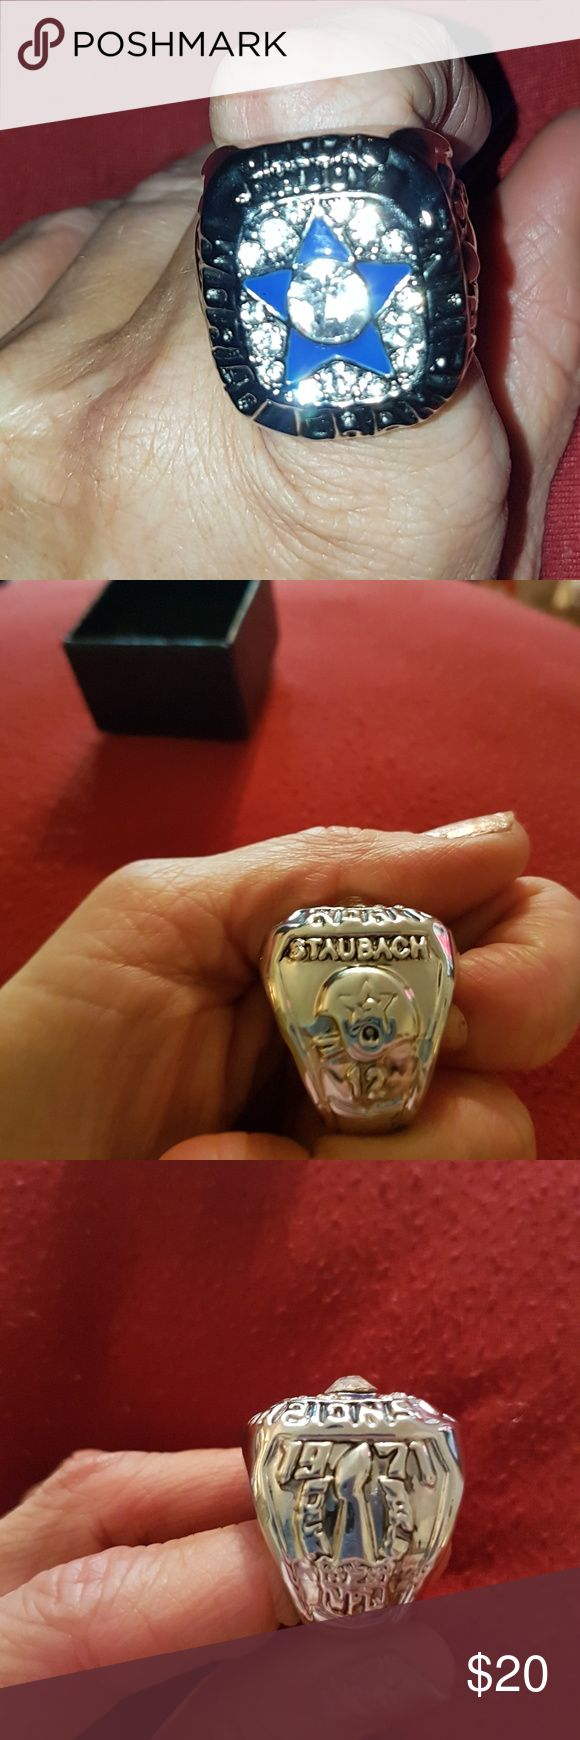 Dallas Cowboys Championship Ring Nice Replica Accessories Jewelry